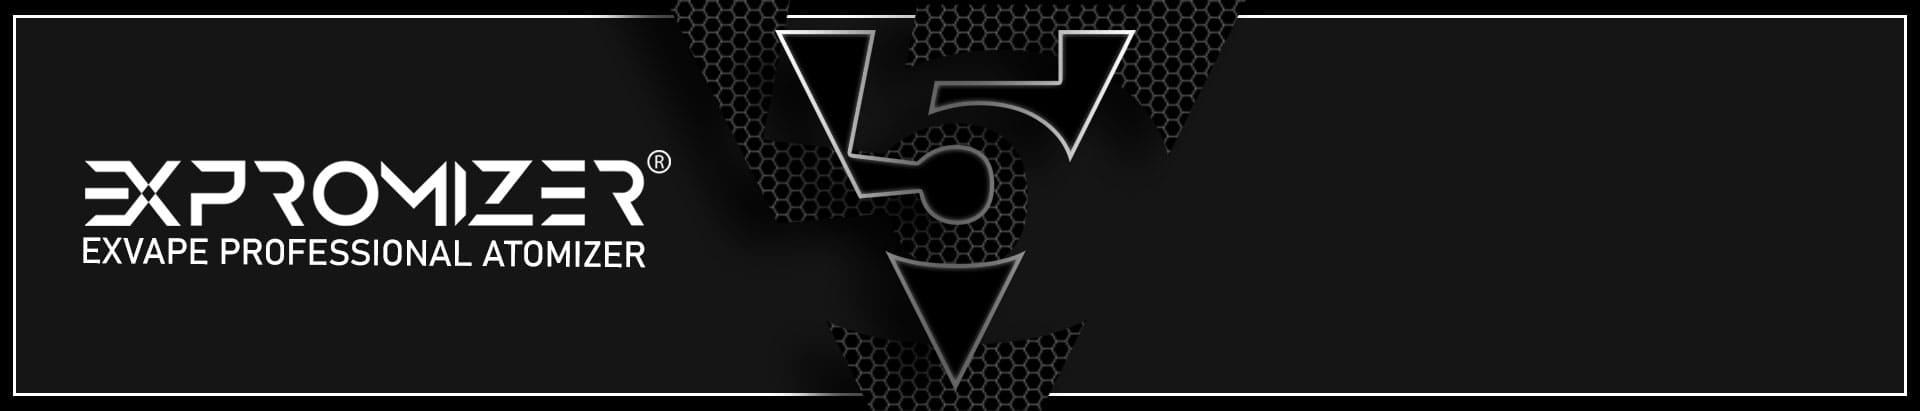 expromizer_v5_banner